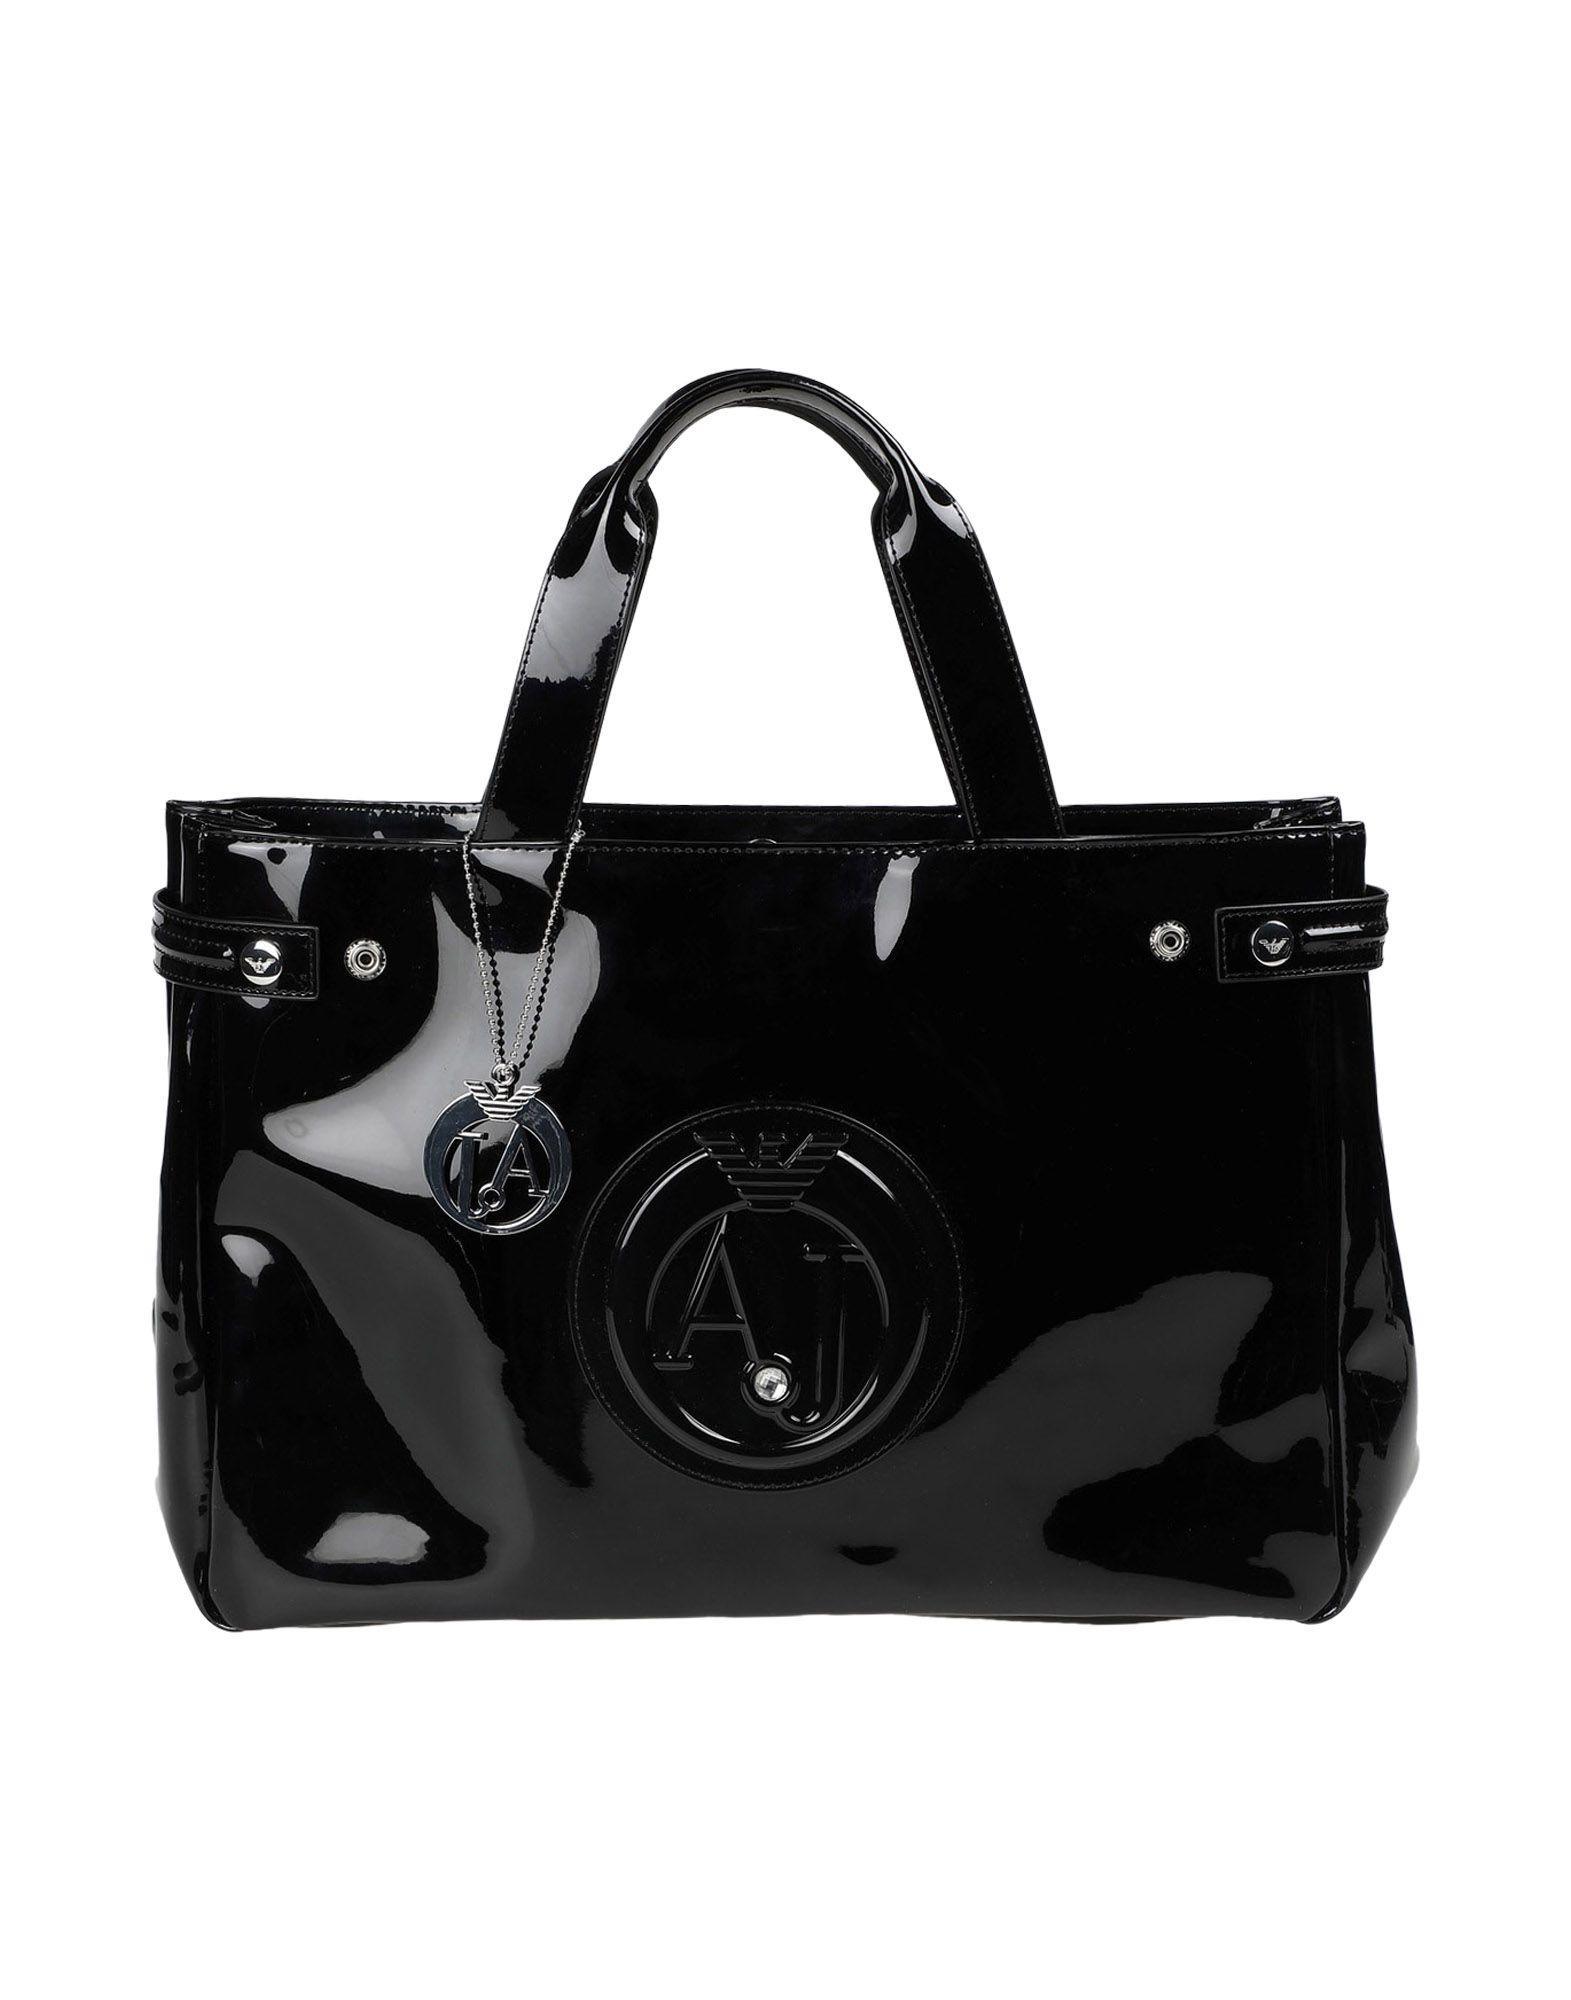 Armani Jeans Handbags In Black